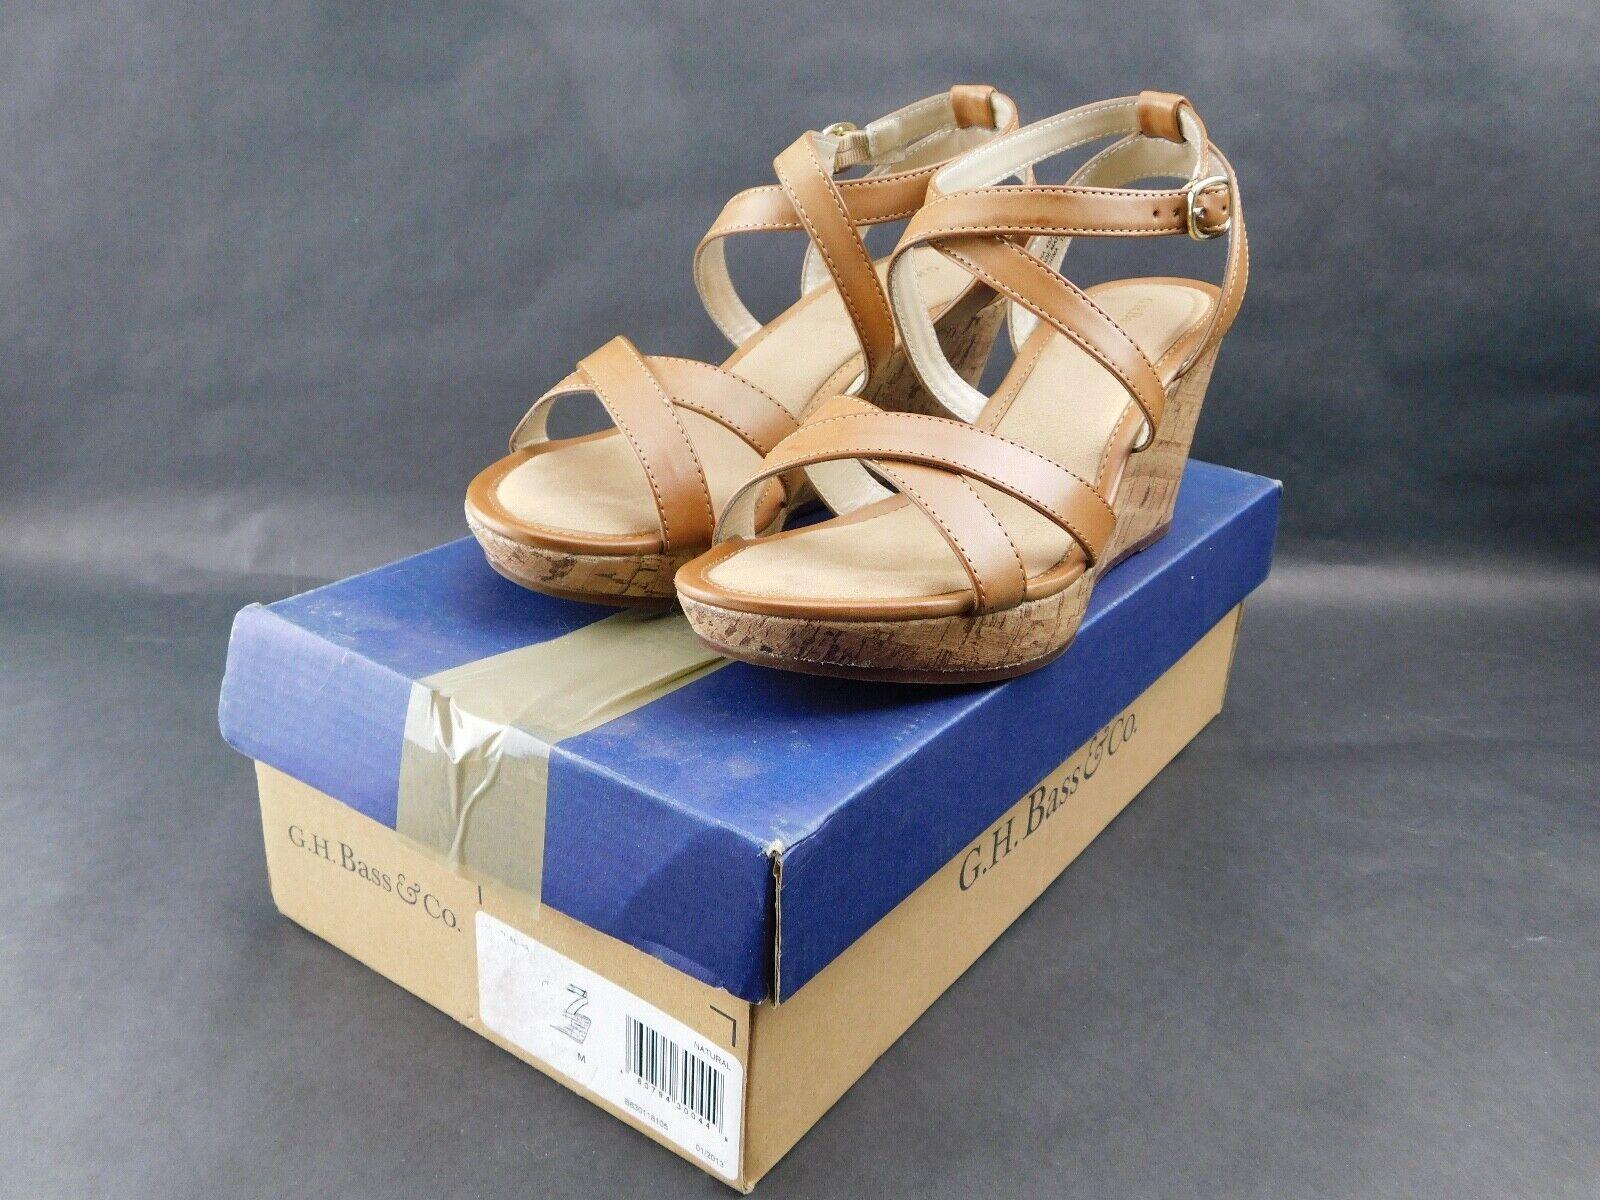 GH Bass NWB Chacha Wedge Tan Sandals 3  Heels Women's  Size 7M